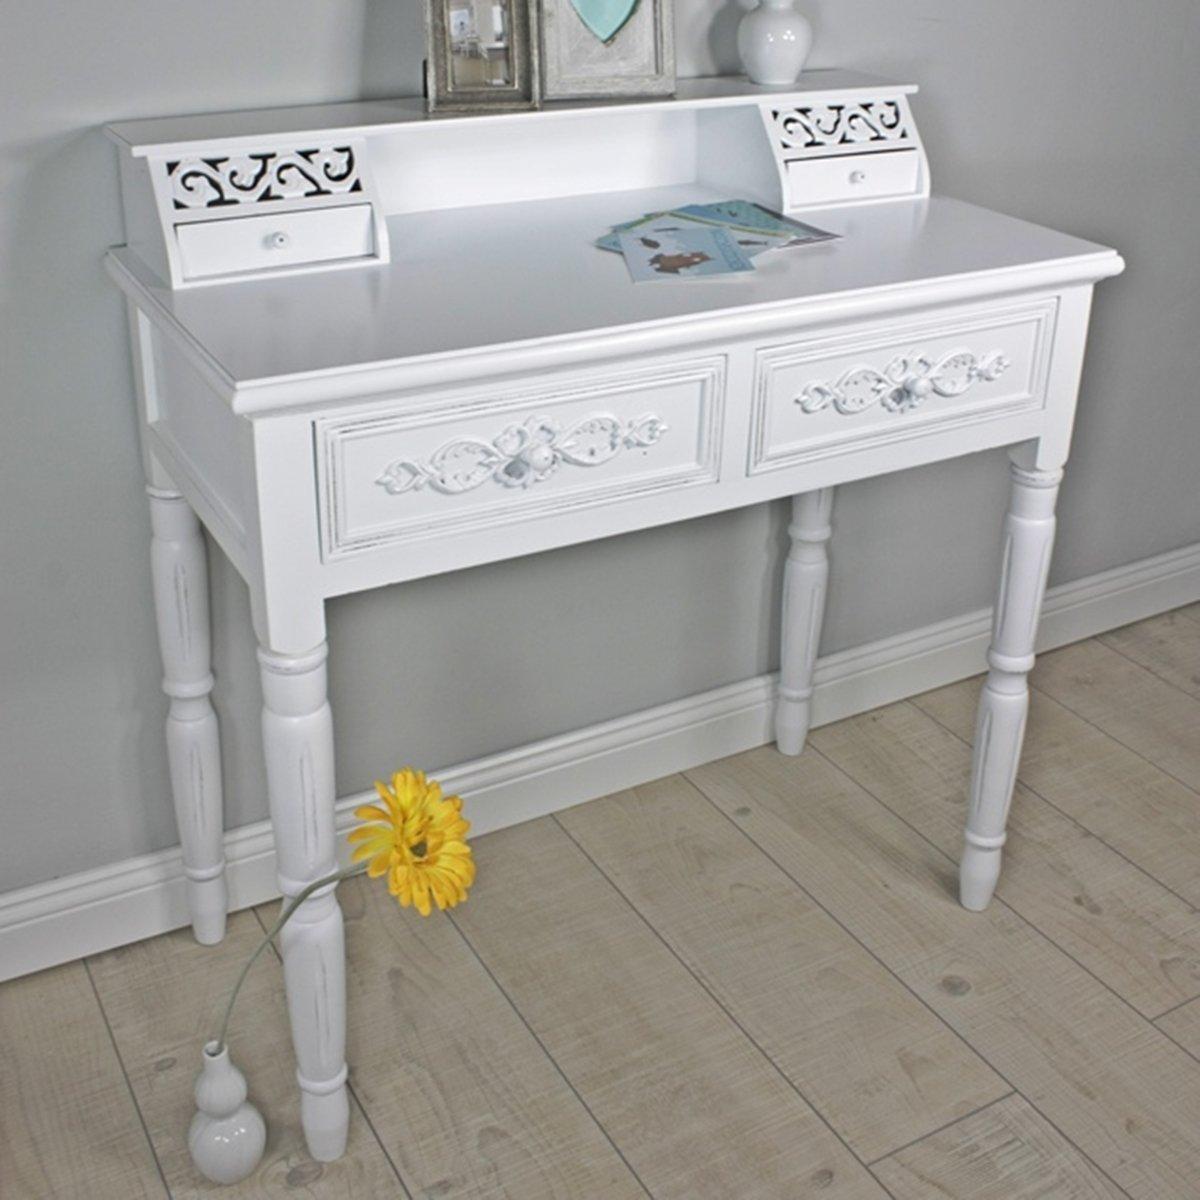 elbmöbel.de Secrétaire - console style rustique Blanc